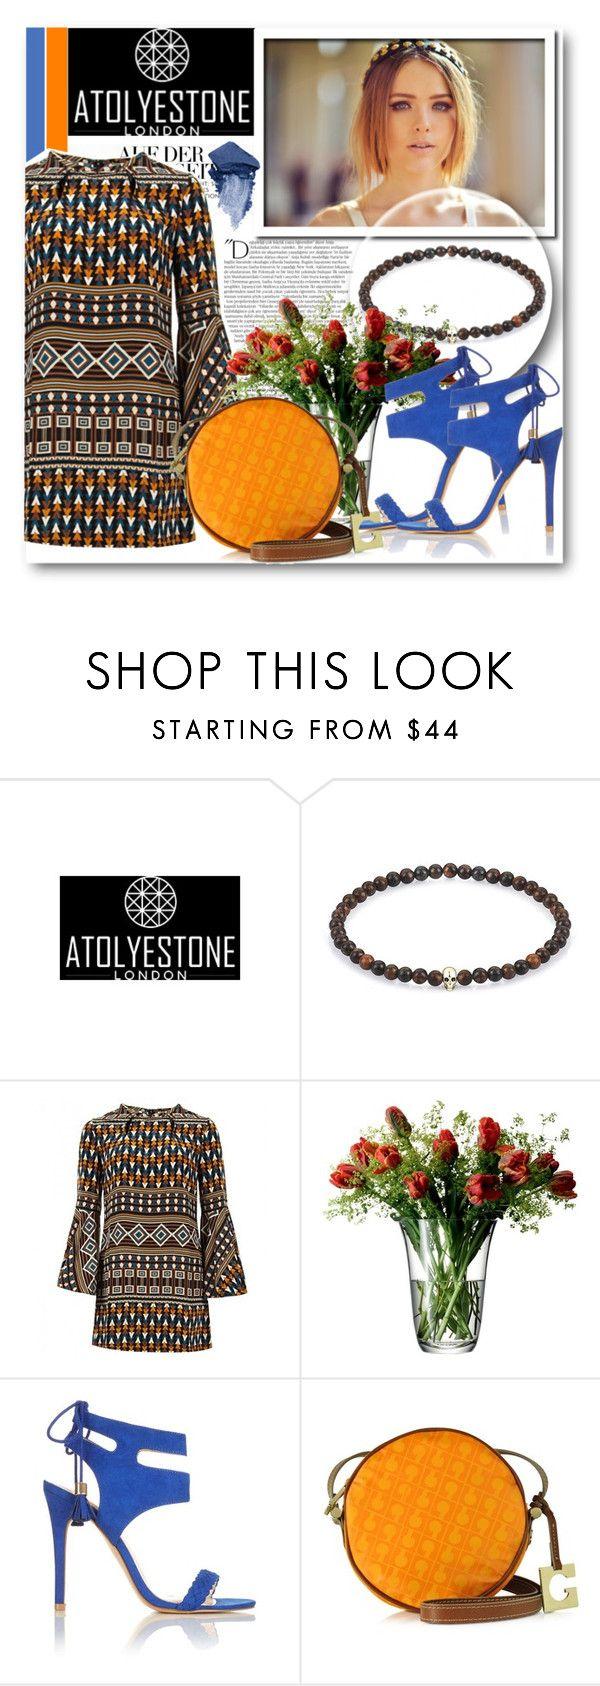 """Atolyestone 17"" by fashionmonsters ❤ liked on Polyvore featuring Balmain, Marni, Gucci, LSA International, Miss Selfridge, Gherardini and Urban Decay"